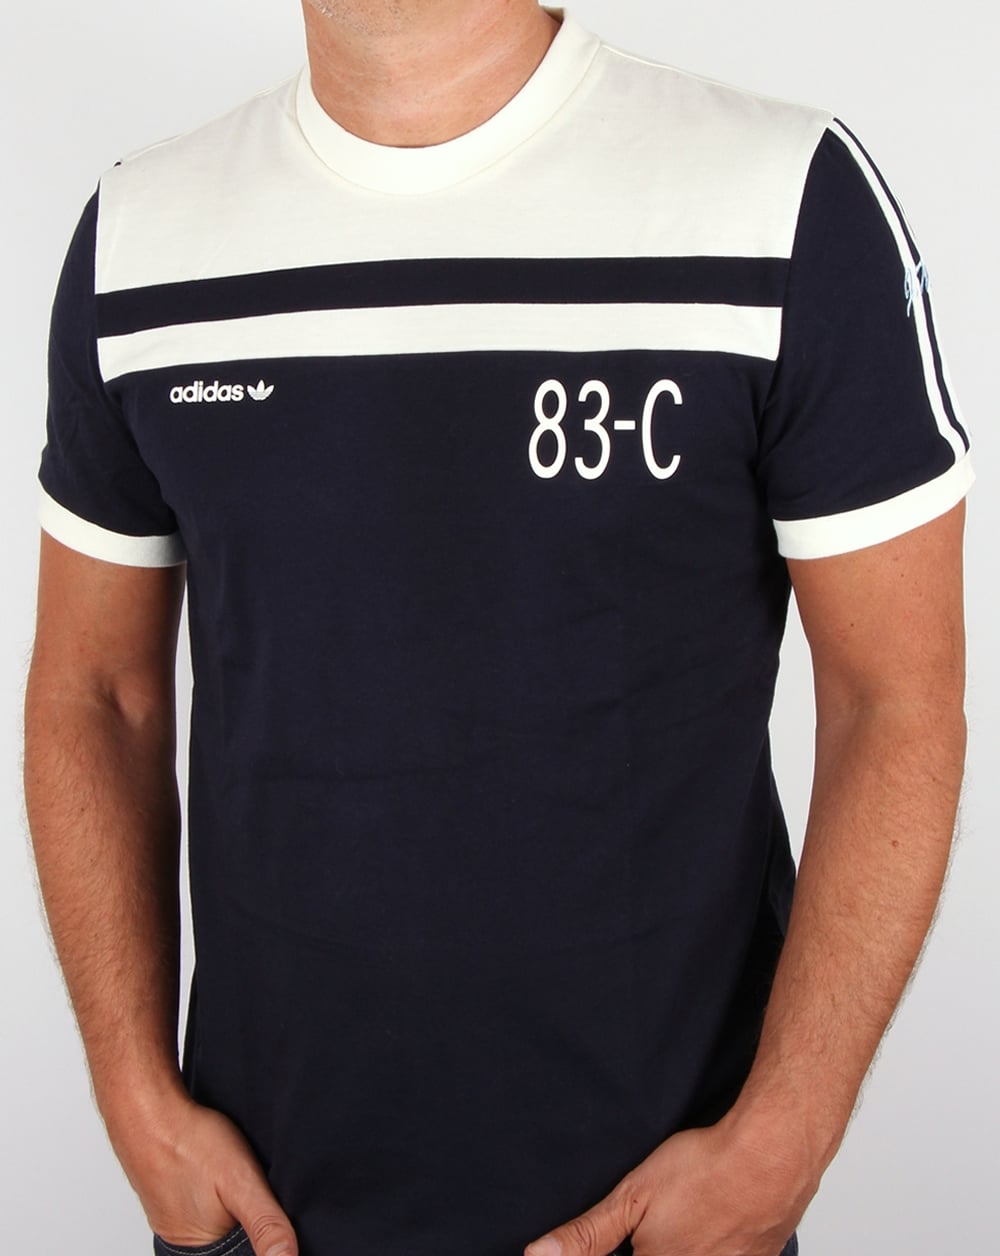 adidas 83c t shirt